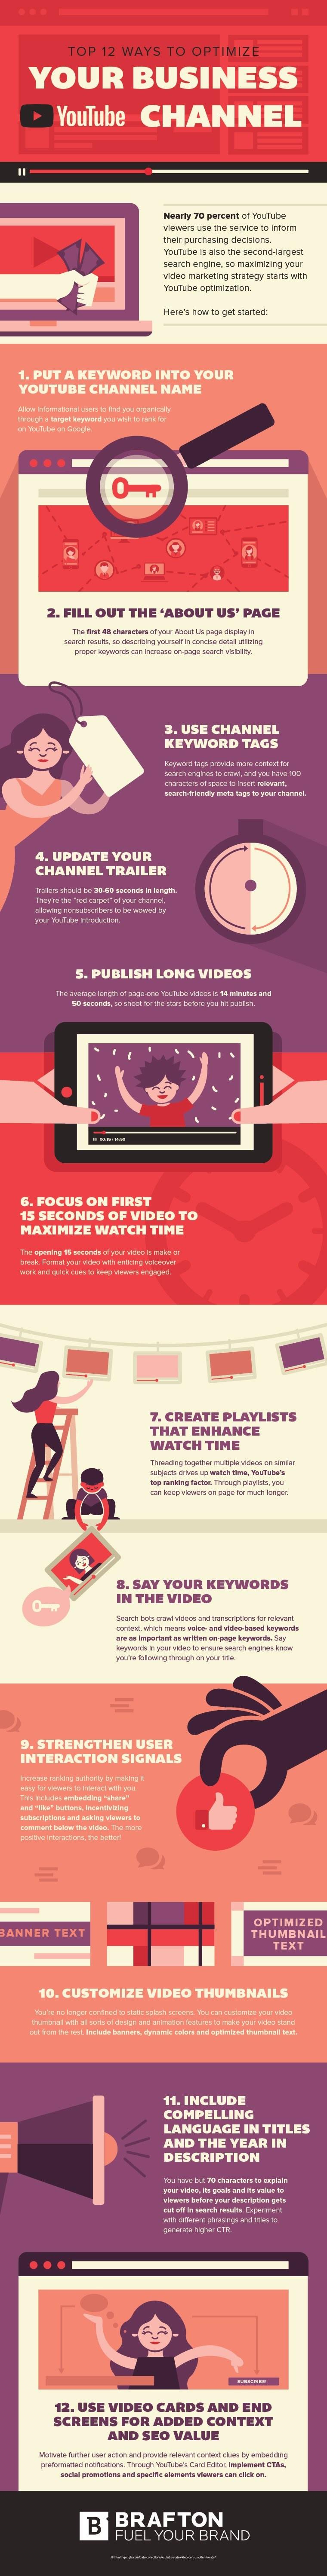 Infographic tips zakelijk YouTube-kanaal